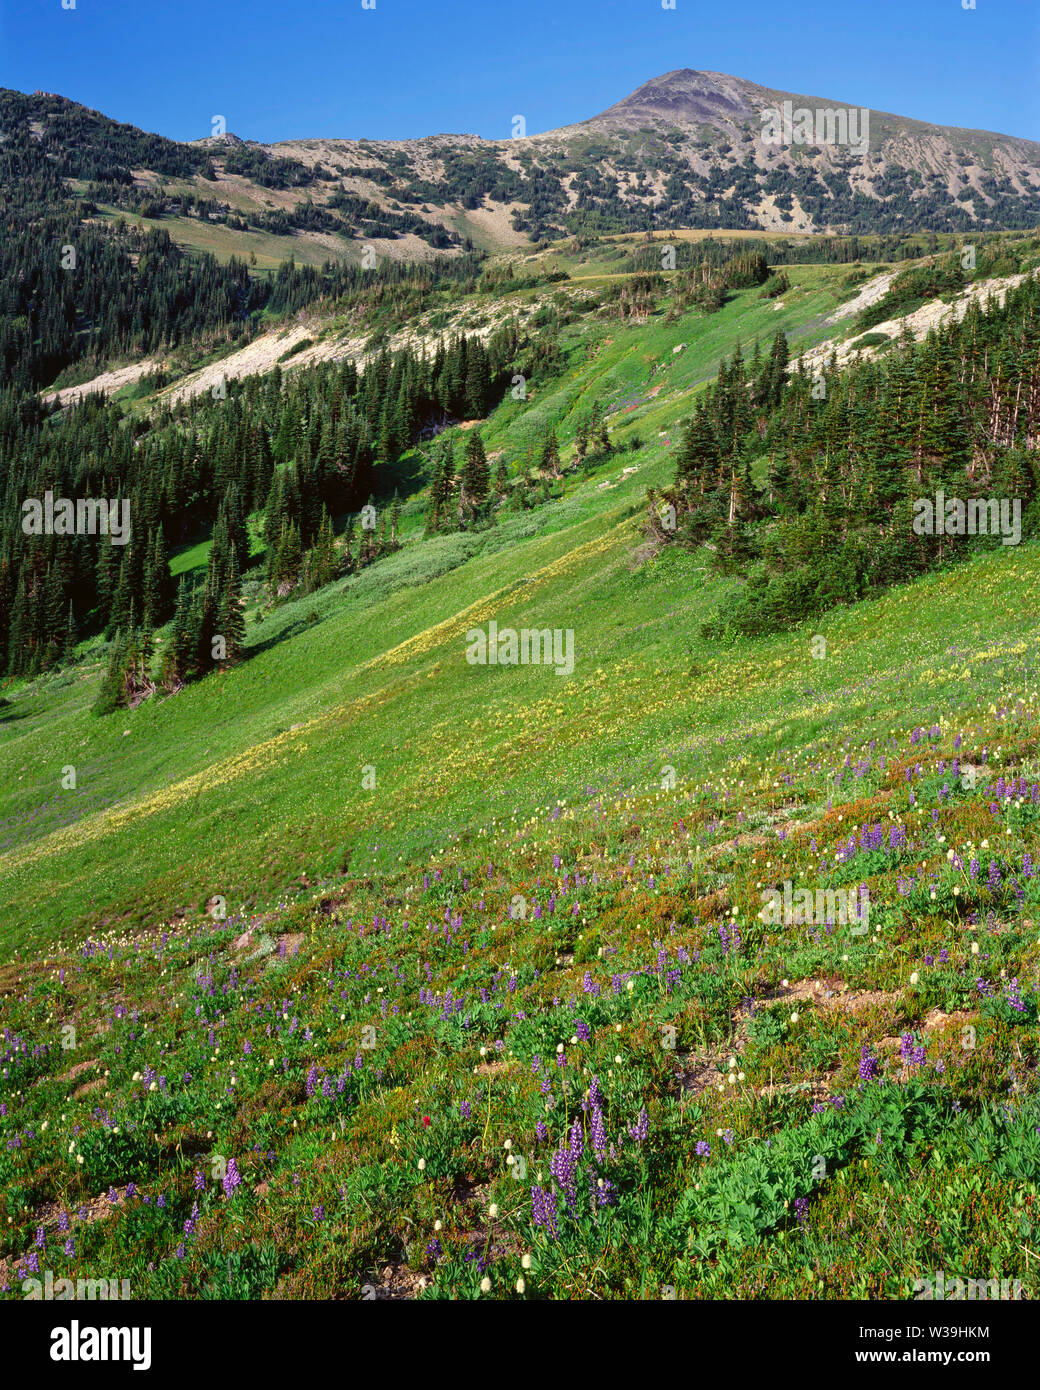 USA, Washington, Mt. Rainier National Park, Wildflower meadow and evergreen trees at Berkeley Park beneath Mt. Fremont. - Stock Image